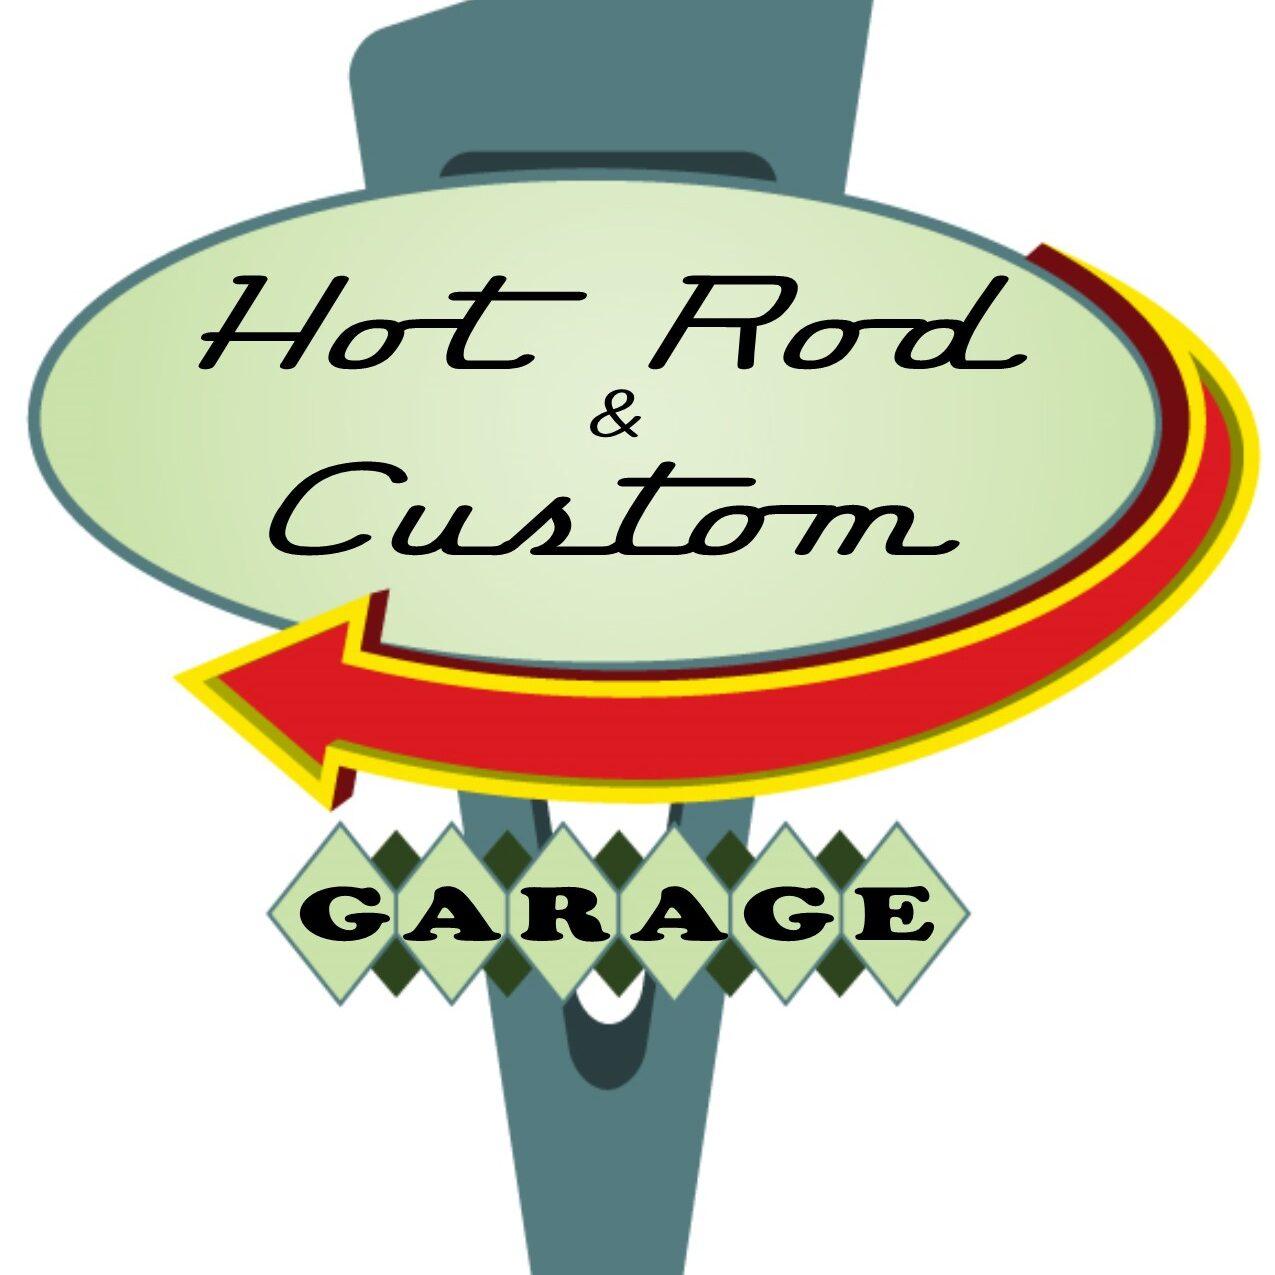 hot-rod-custom-garage-logo-sema